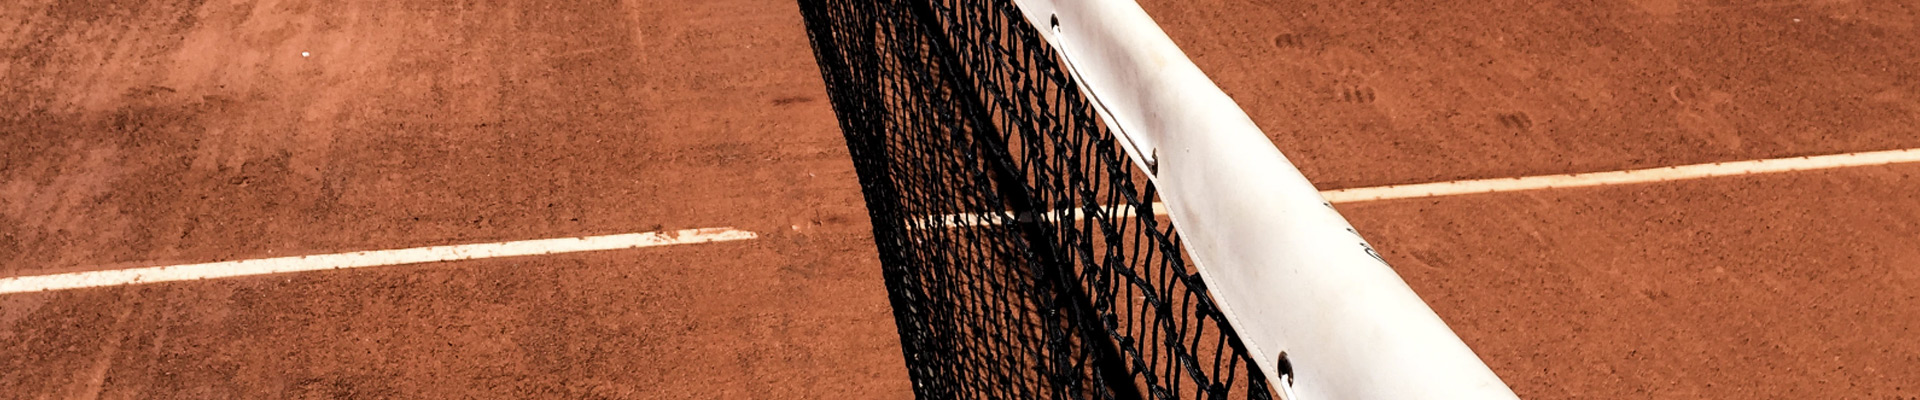 Filet de tennis de Villers-sur-Mer